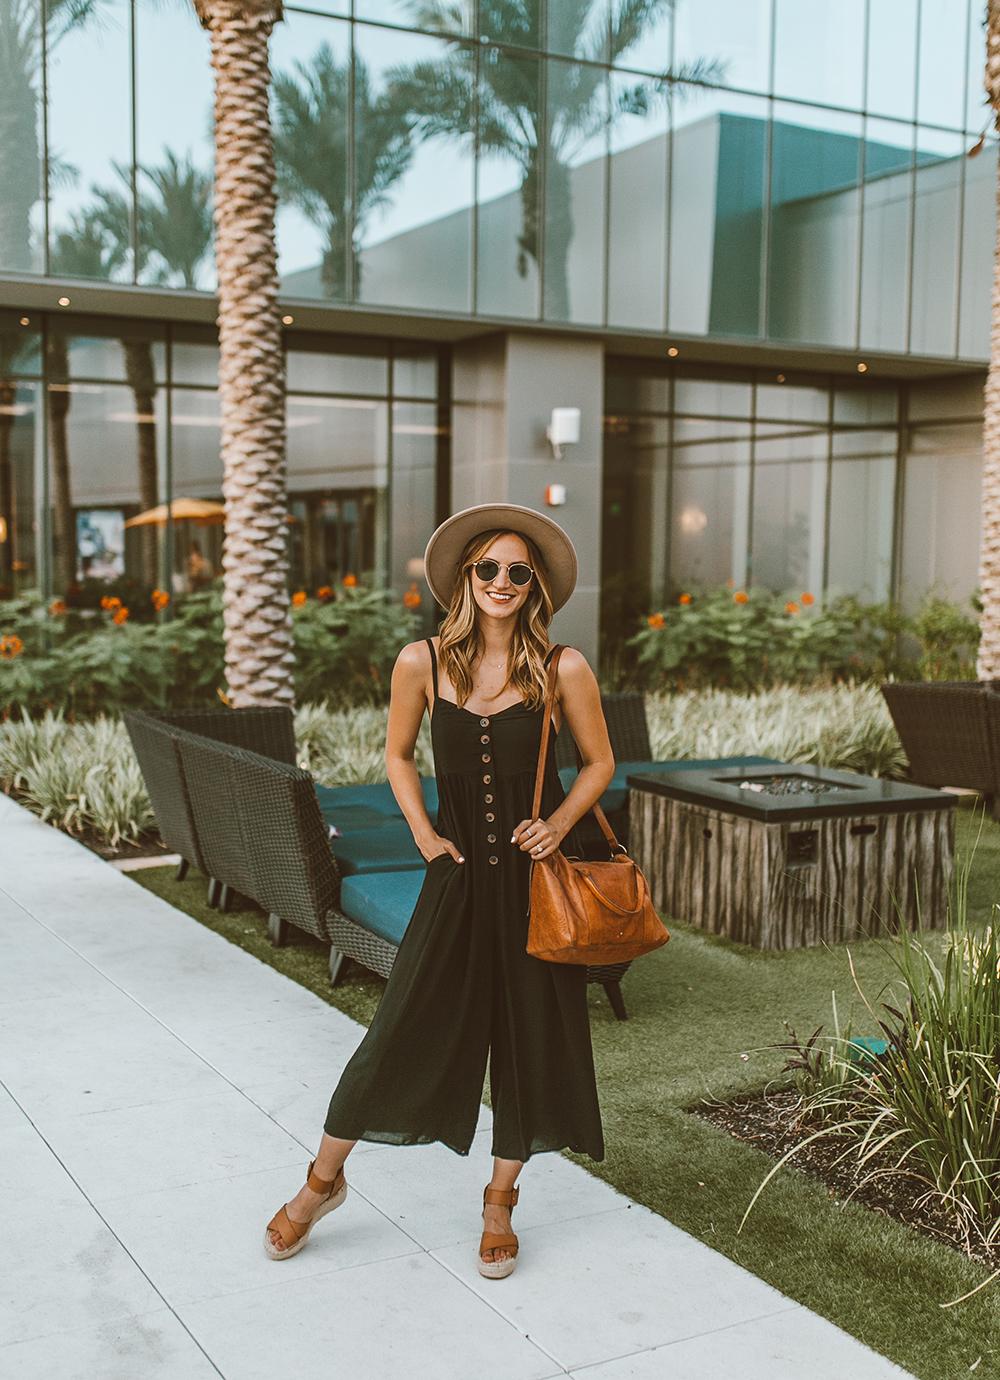 livvyland-blog-olivia-watson-austin-texas-lifestyle-blogger-fairmont-hotel-atx-downtown-2